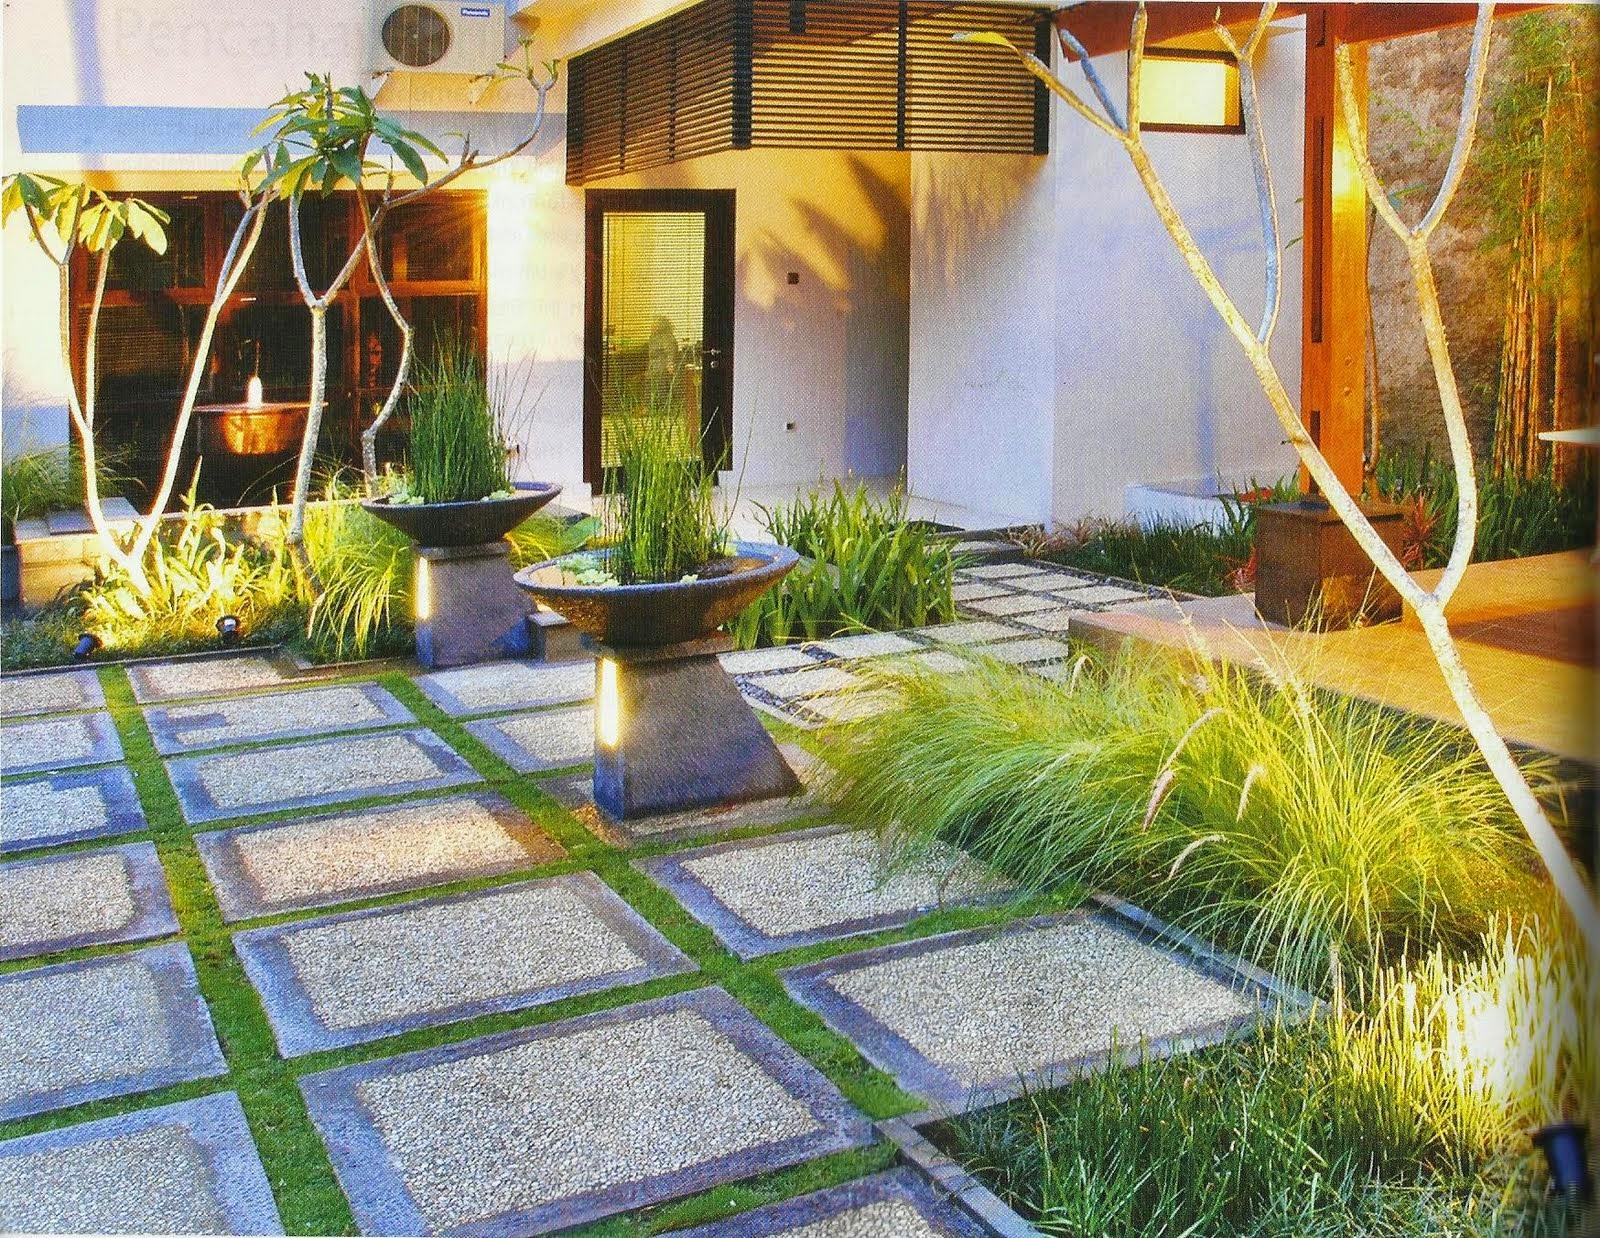 Minimalist House Garden Design Concept  Inspiring